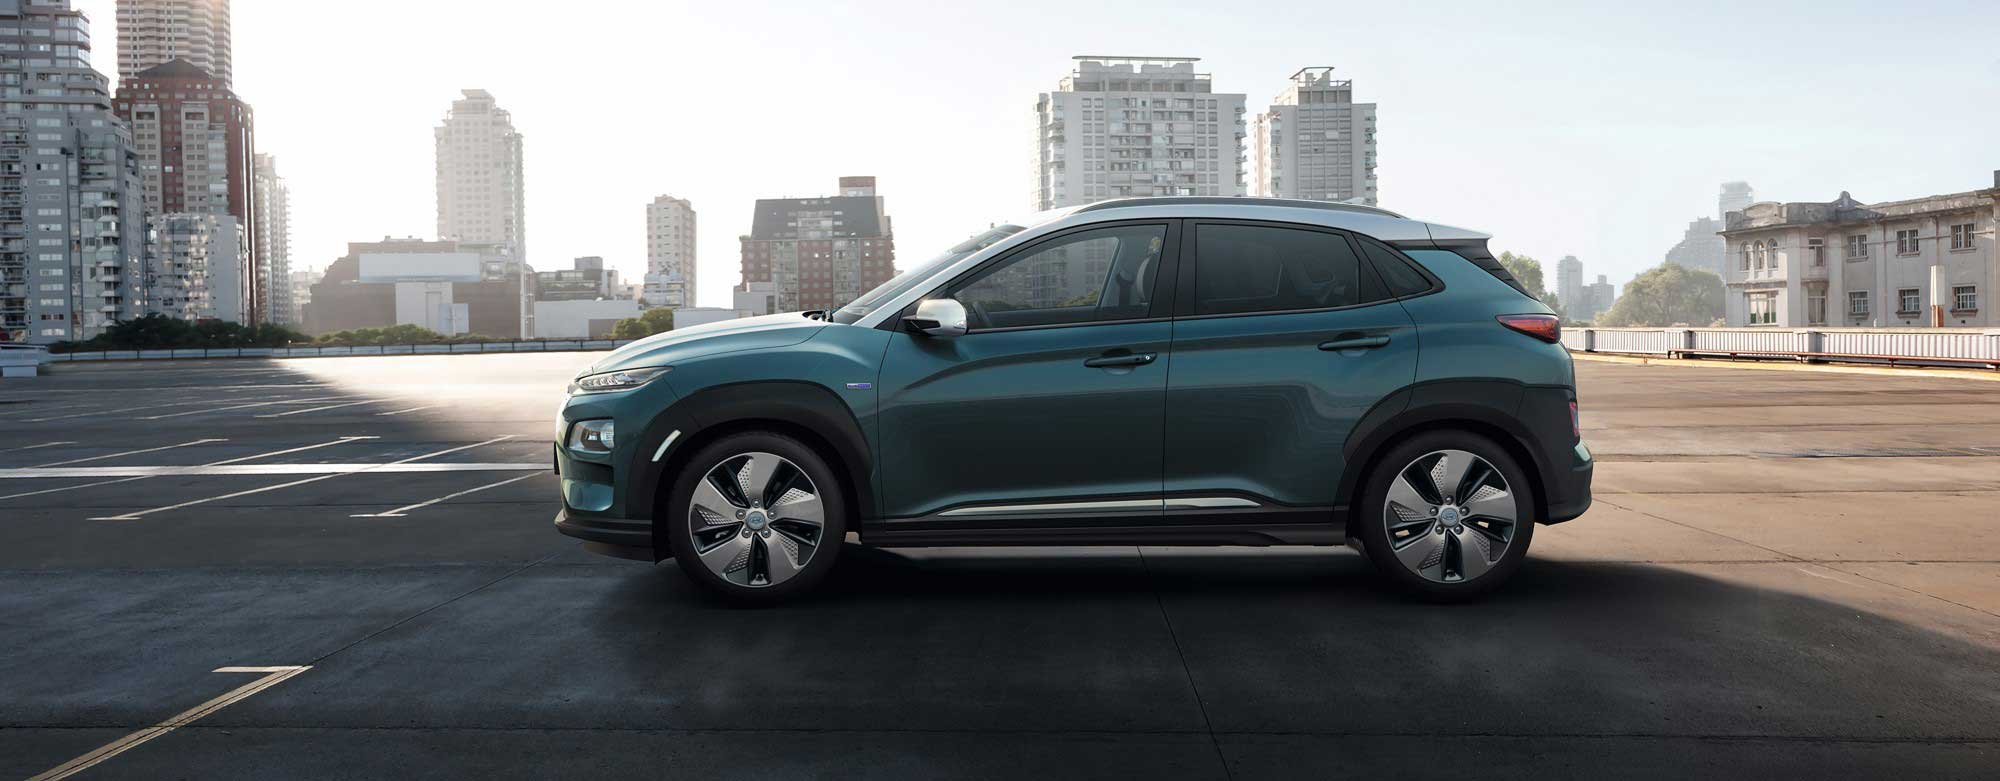 Novo Hyundai KAUAI Electric